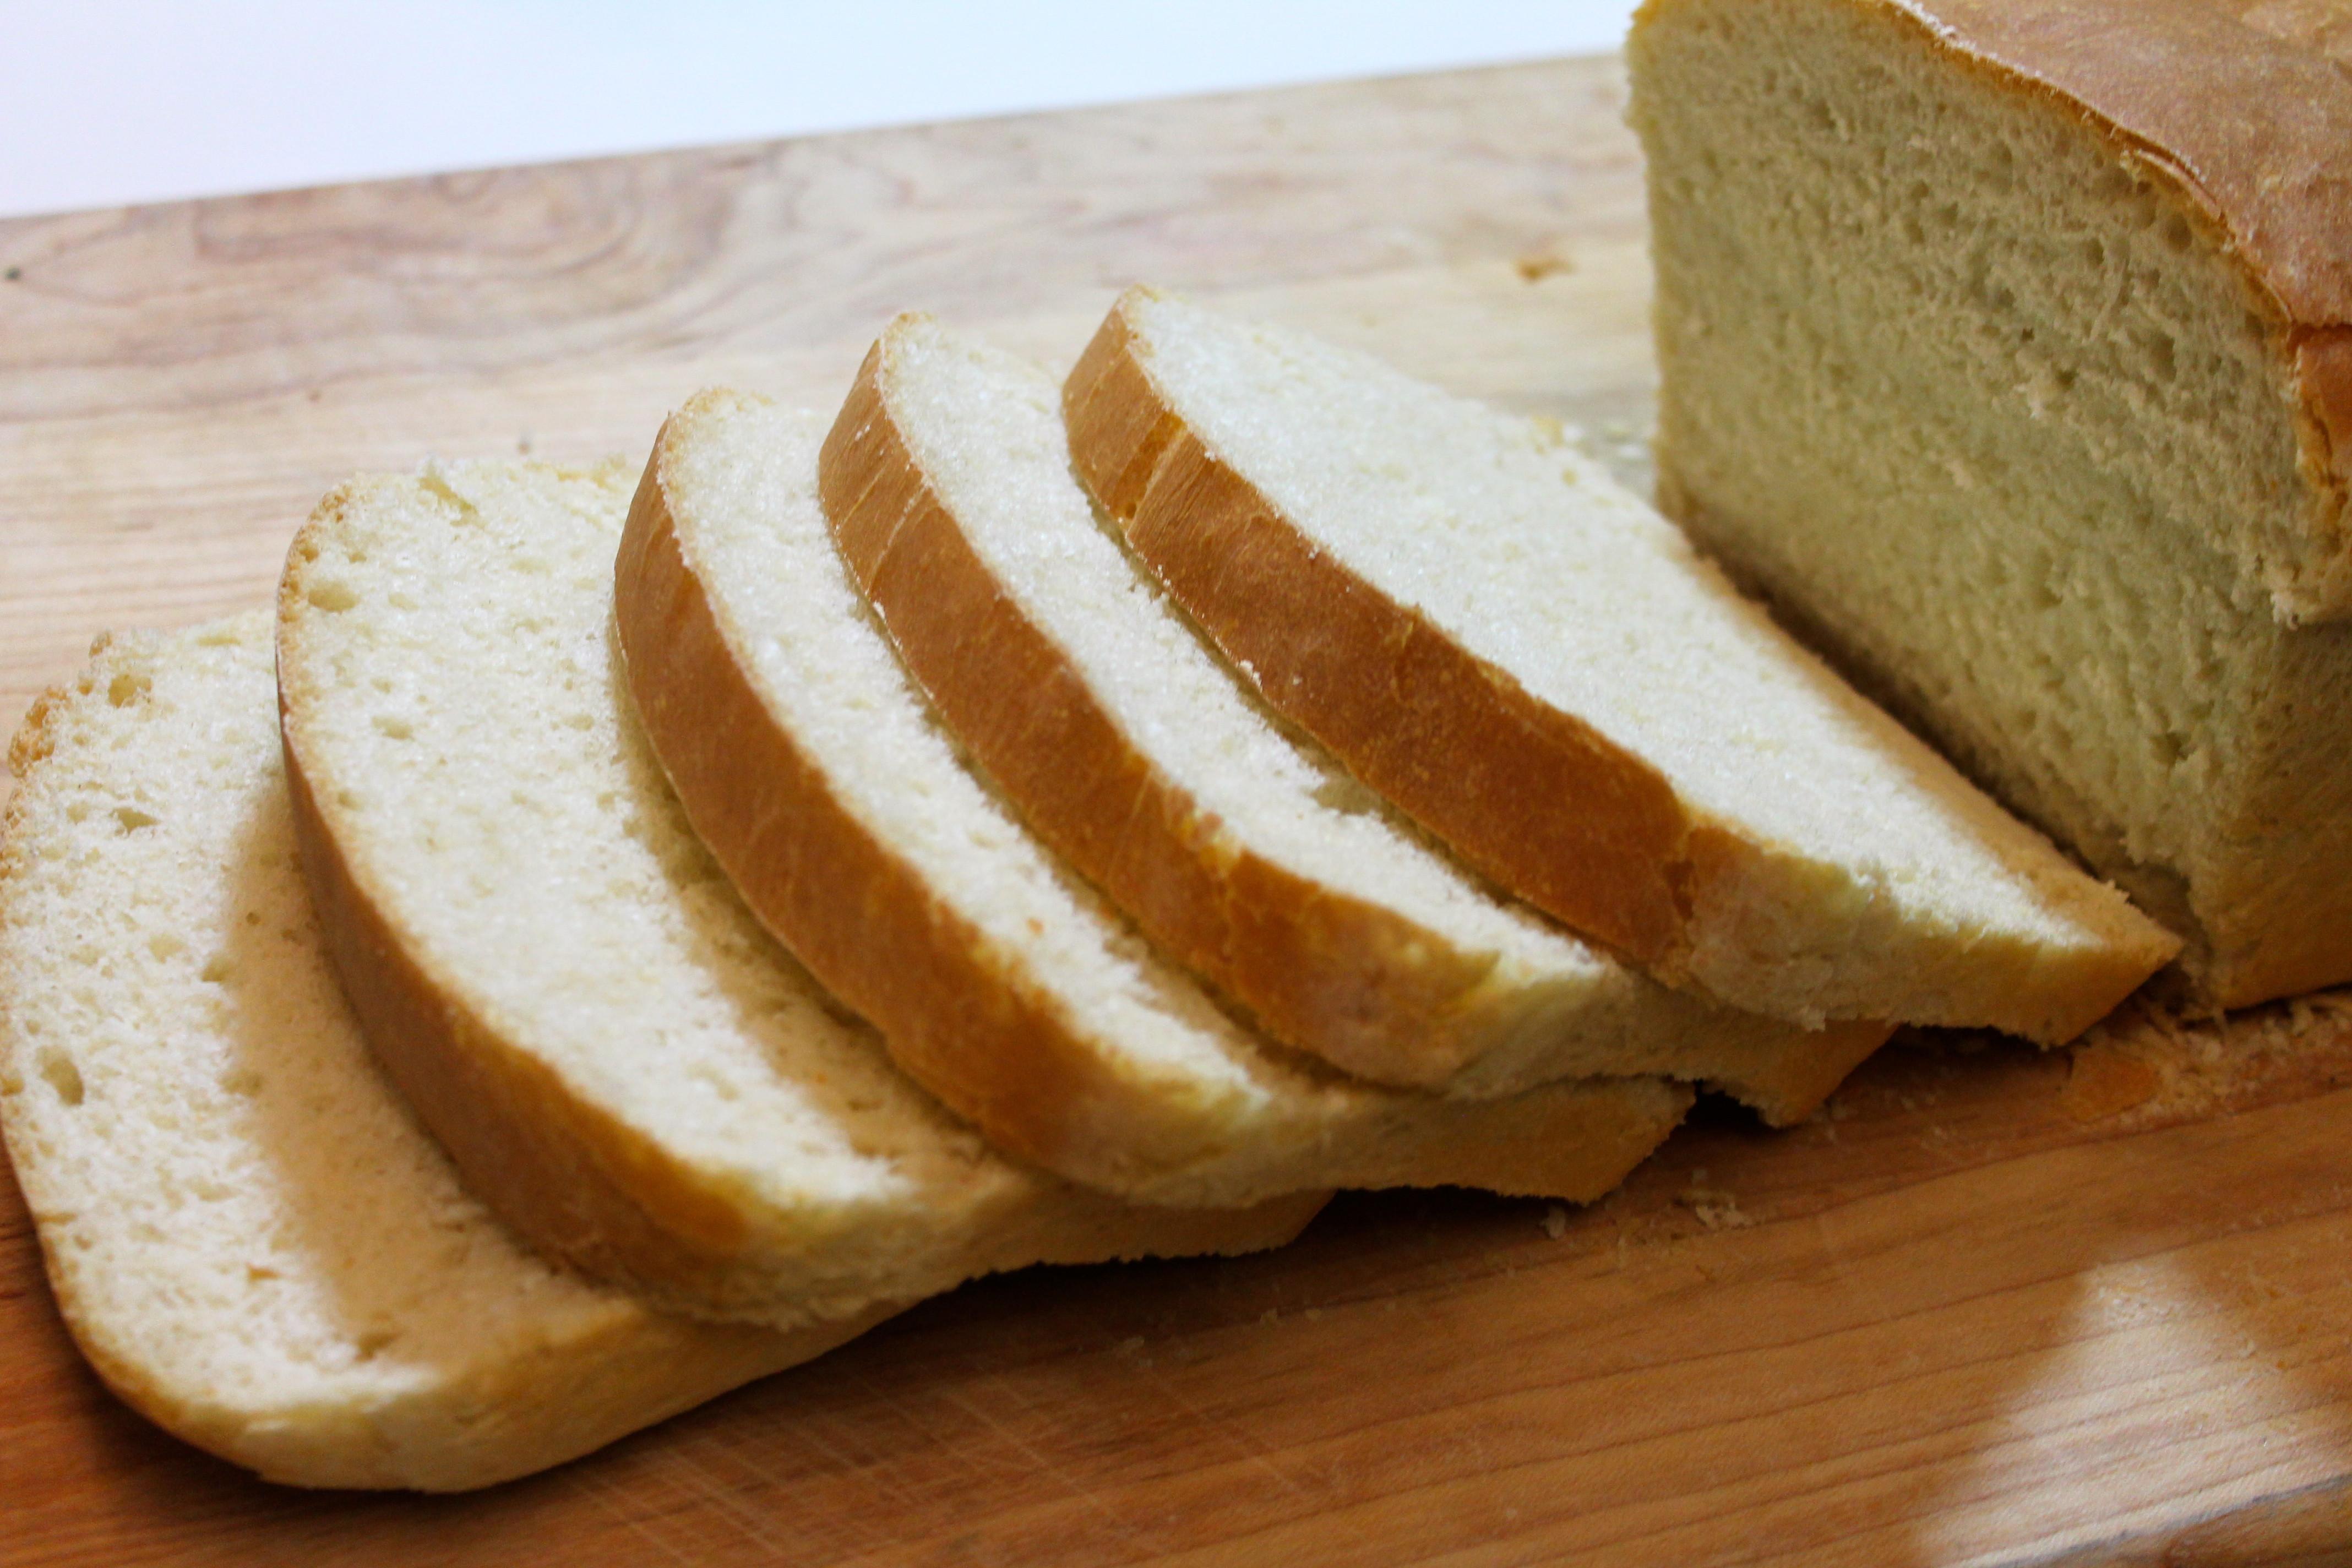 Homemade Bread Recipe  How to Make Homemade White Bread